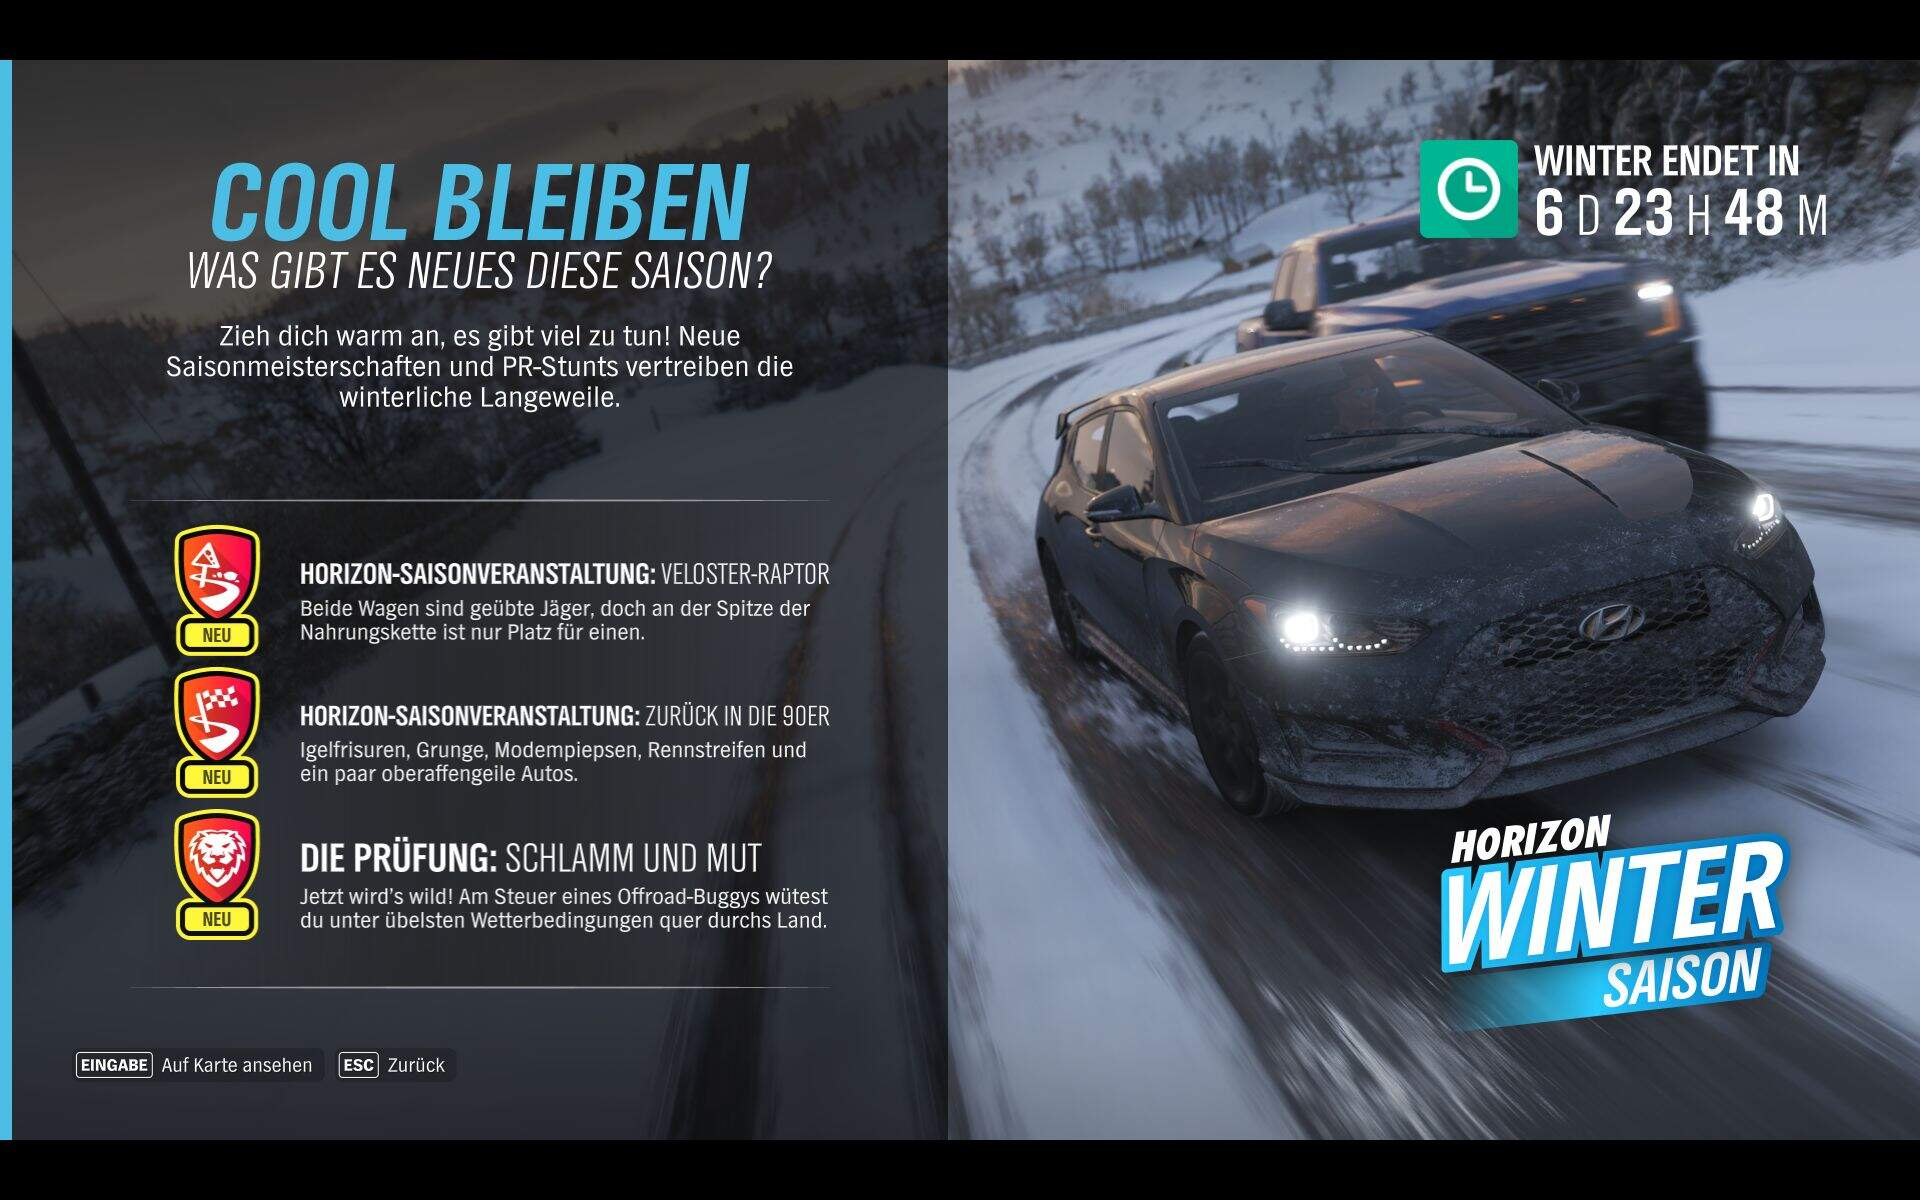 Forza Horizon 4 Winter KW 45